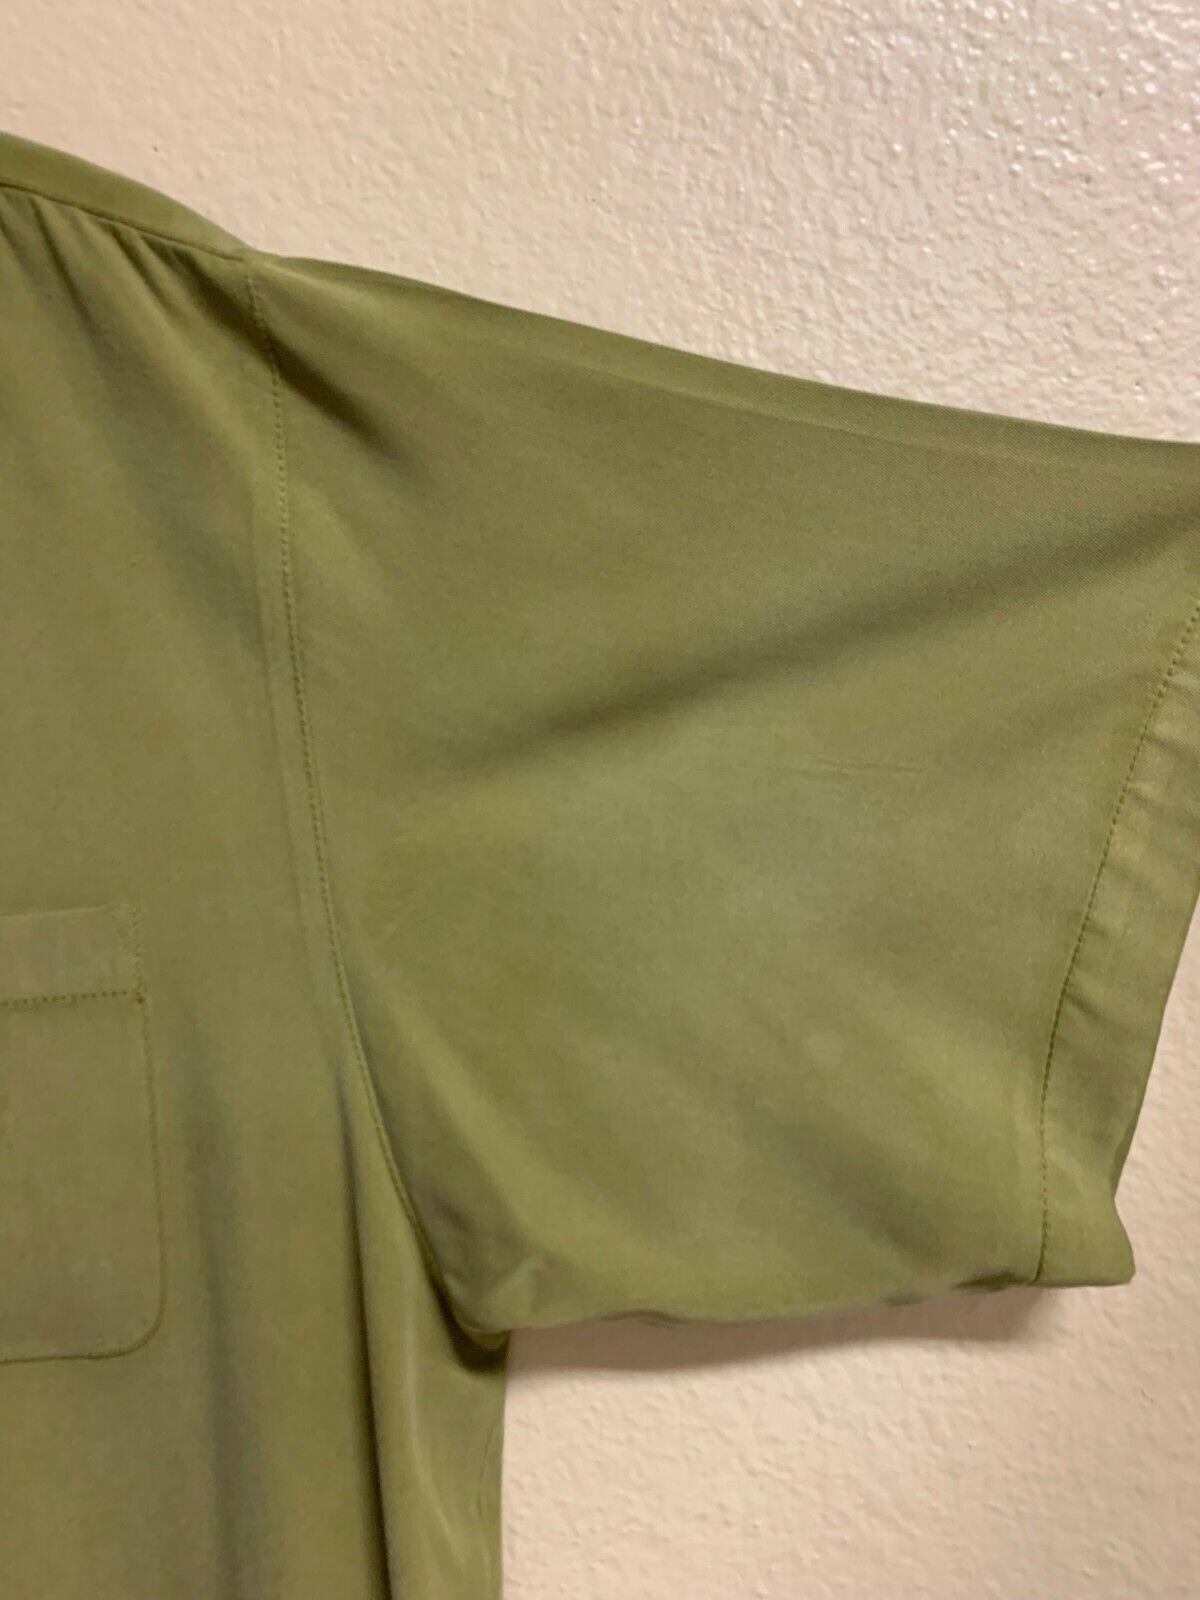 Green Tommy Bahama 100% Silk Shirt - image 2